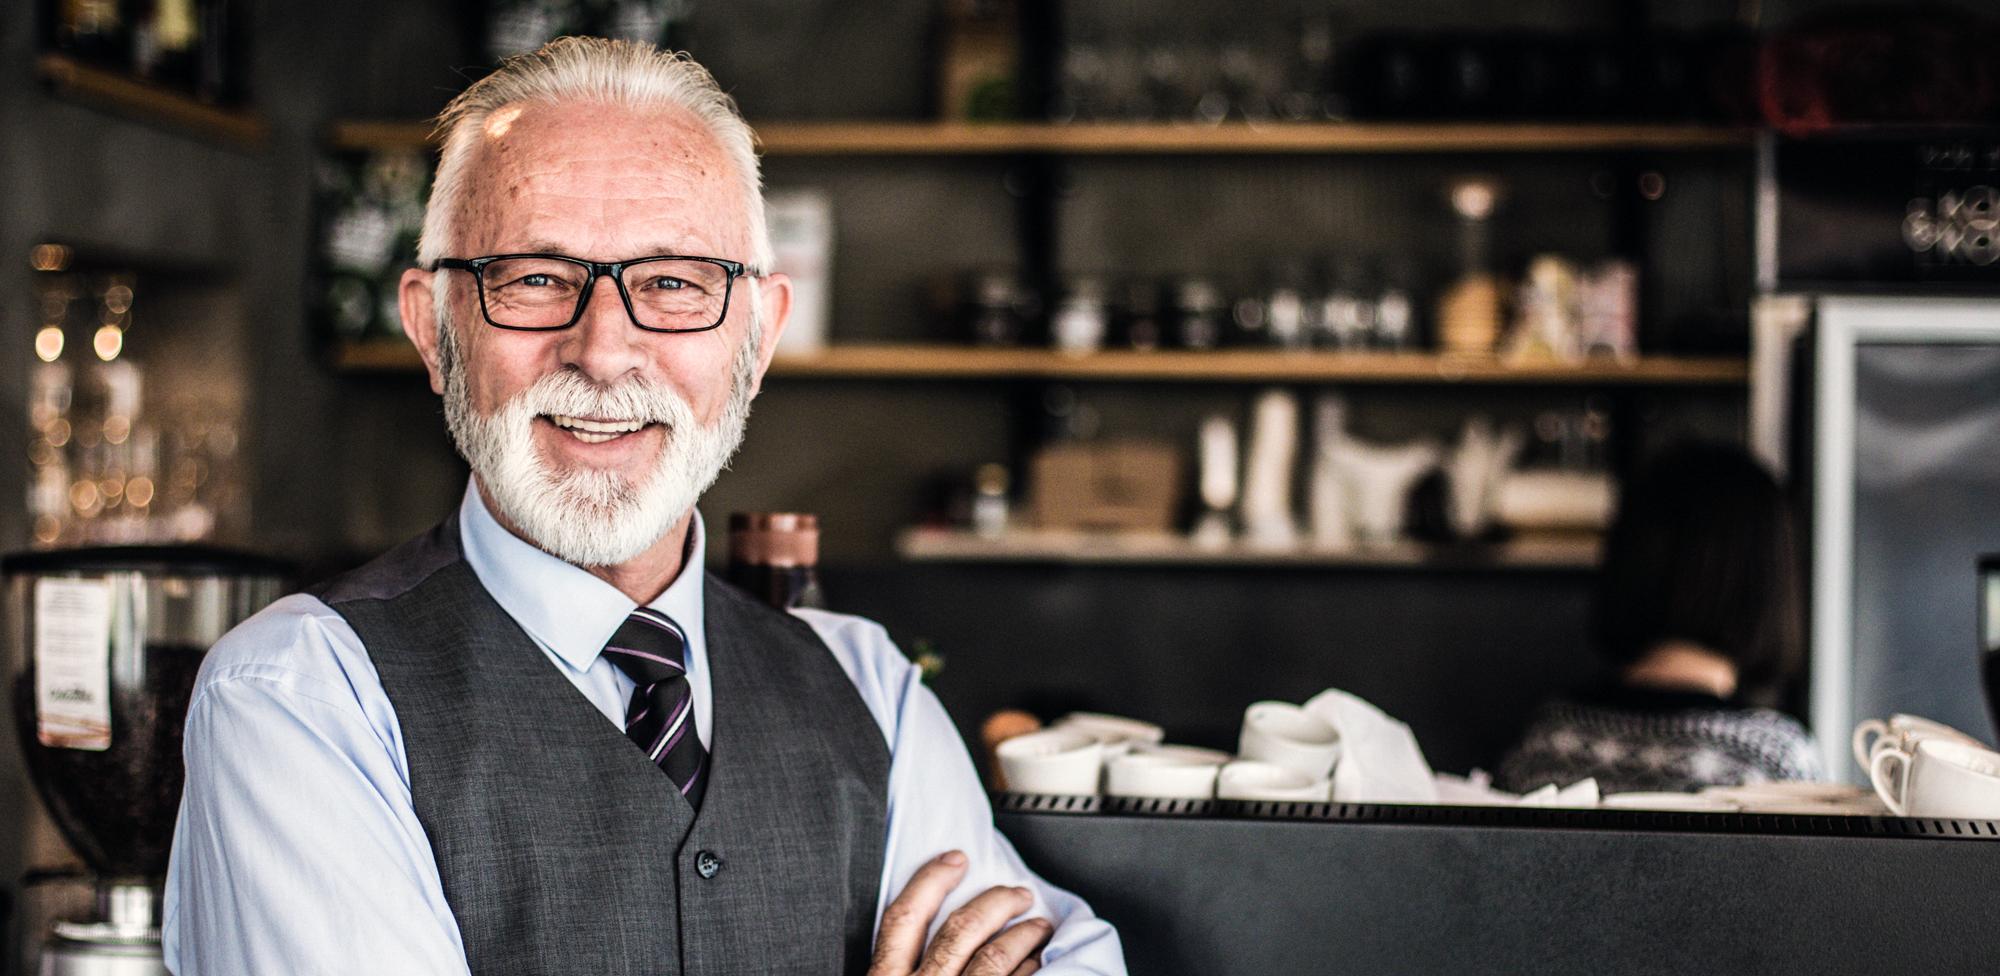 older business man smiling in restaurant